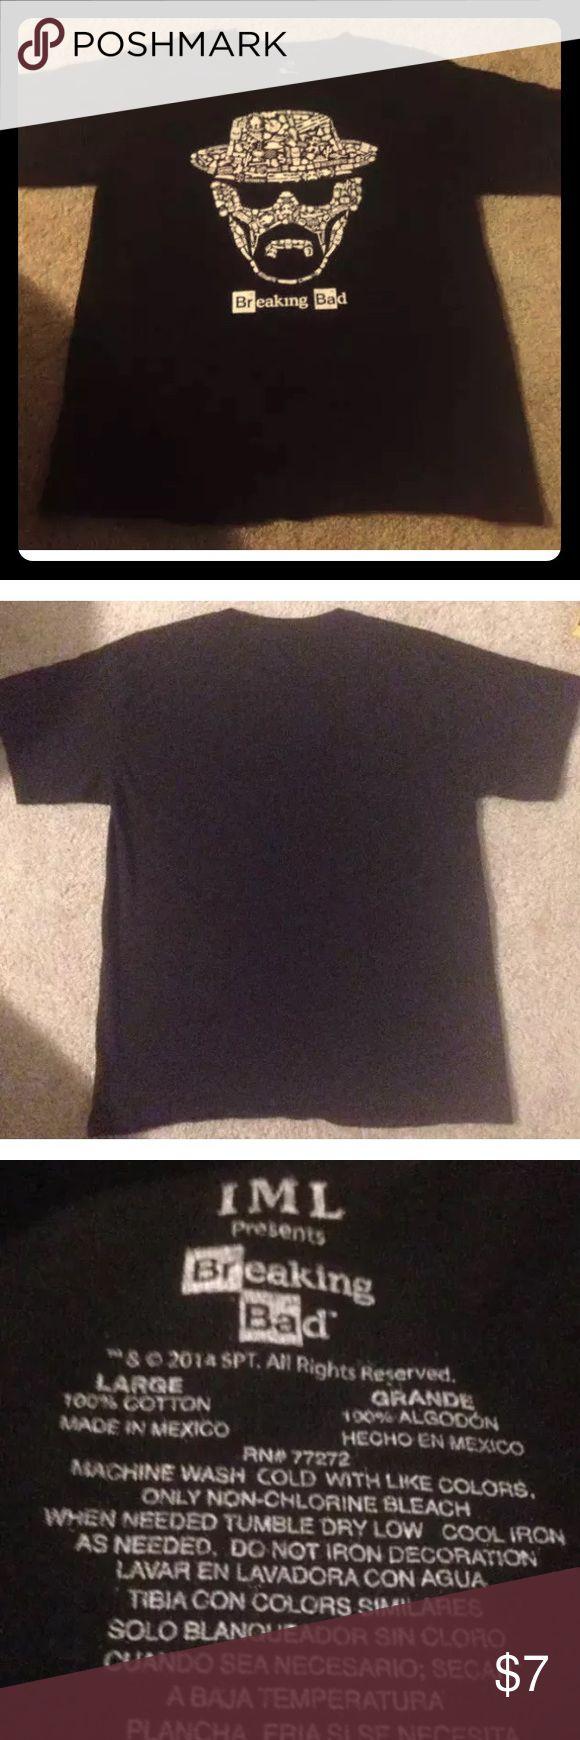 Men's Breaking Bad Graphic T Shirt Men's Breaking Bad T Shirt Size Large. Shirts Tees - Short Sleeve